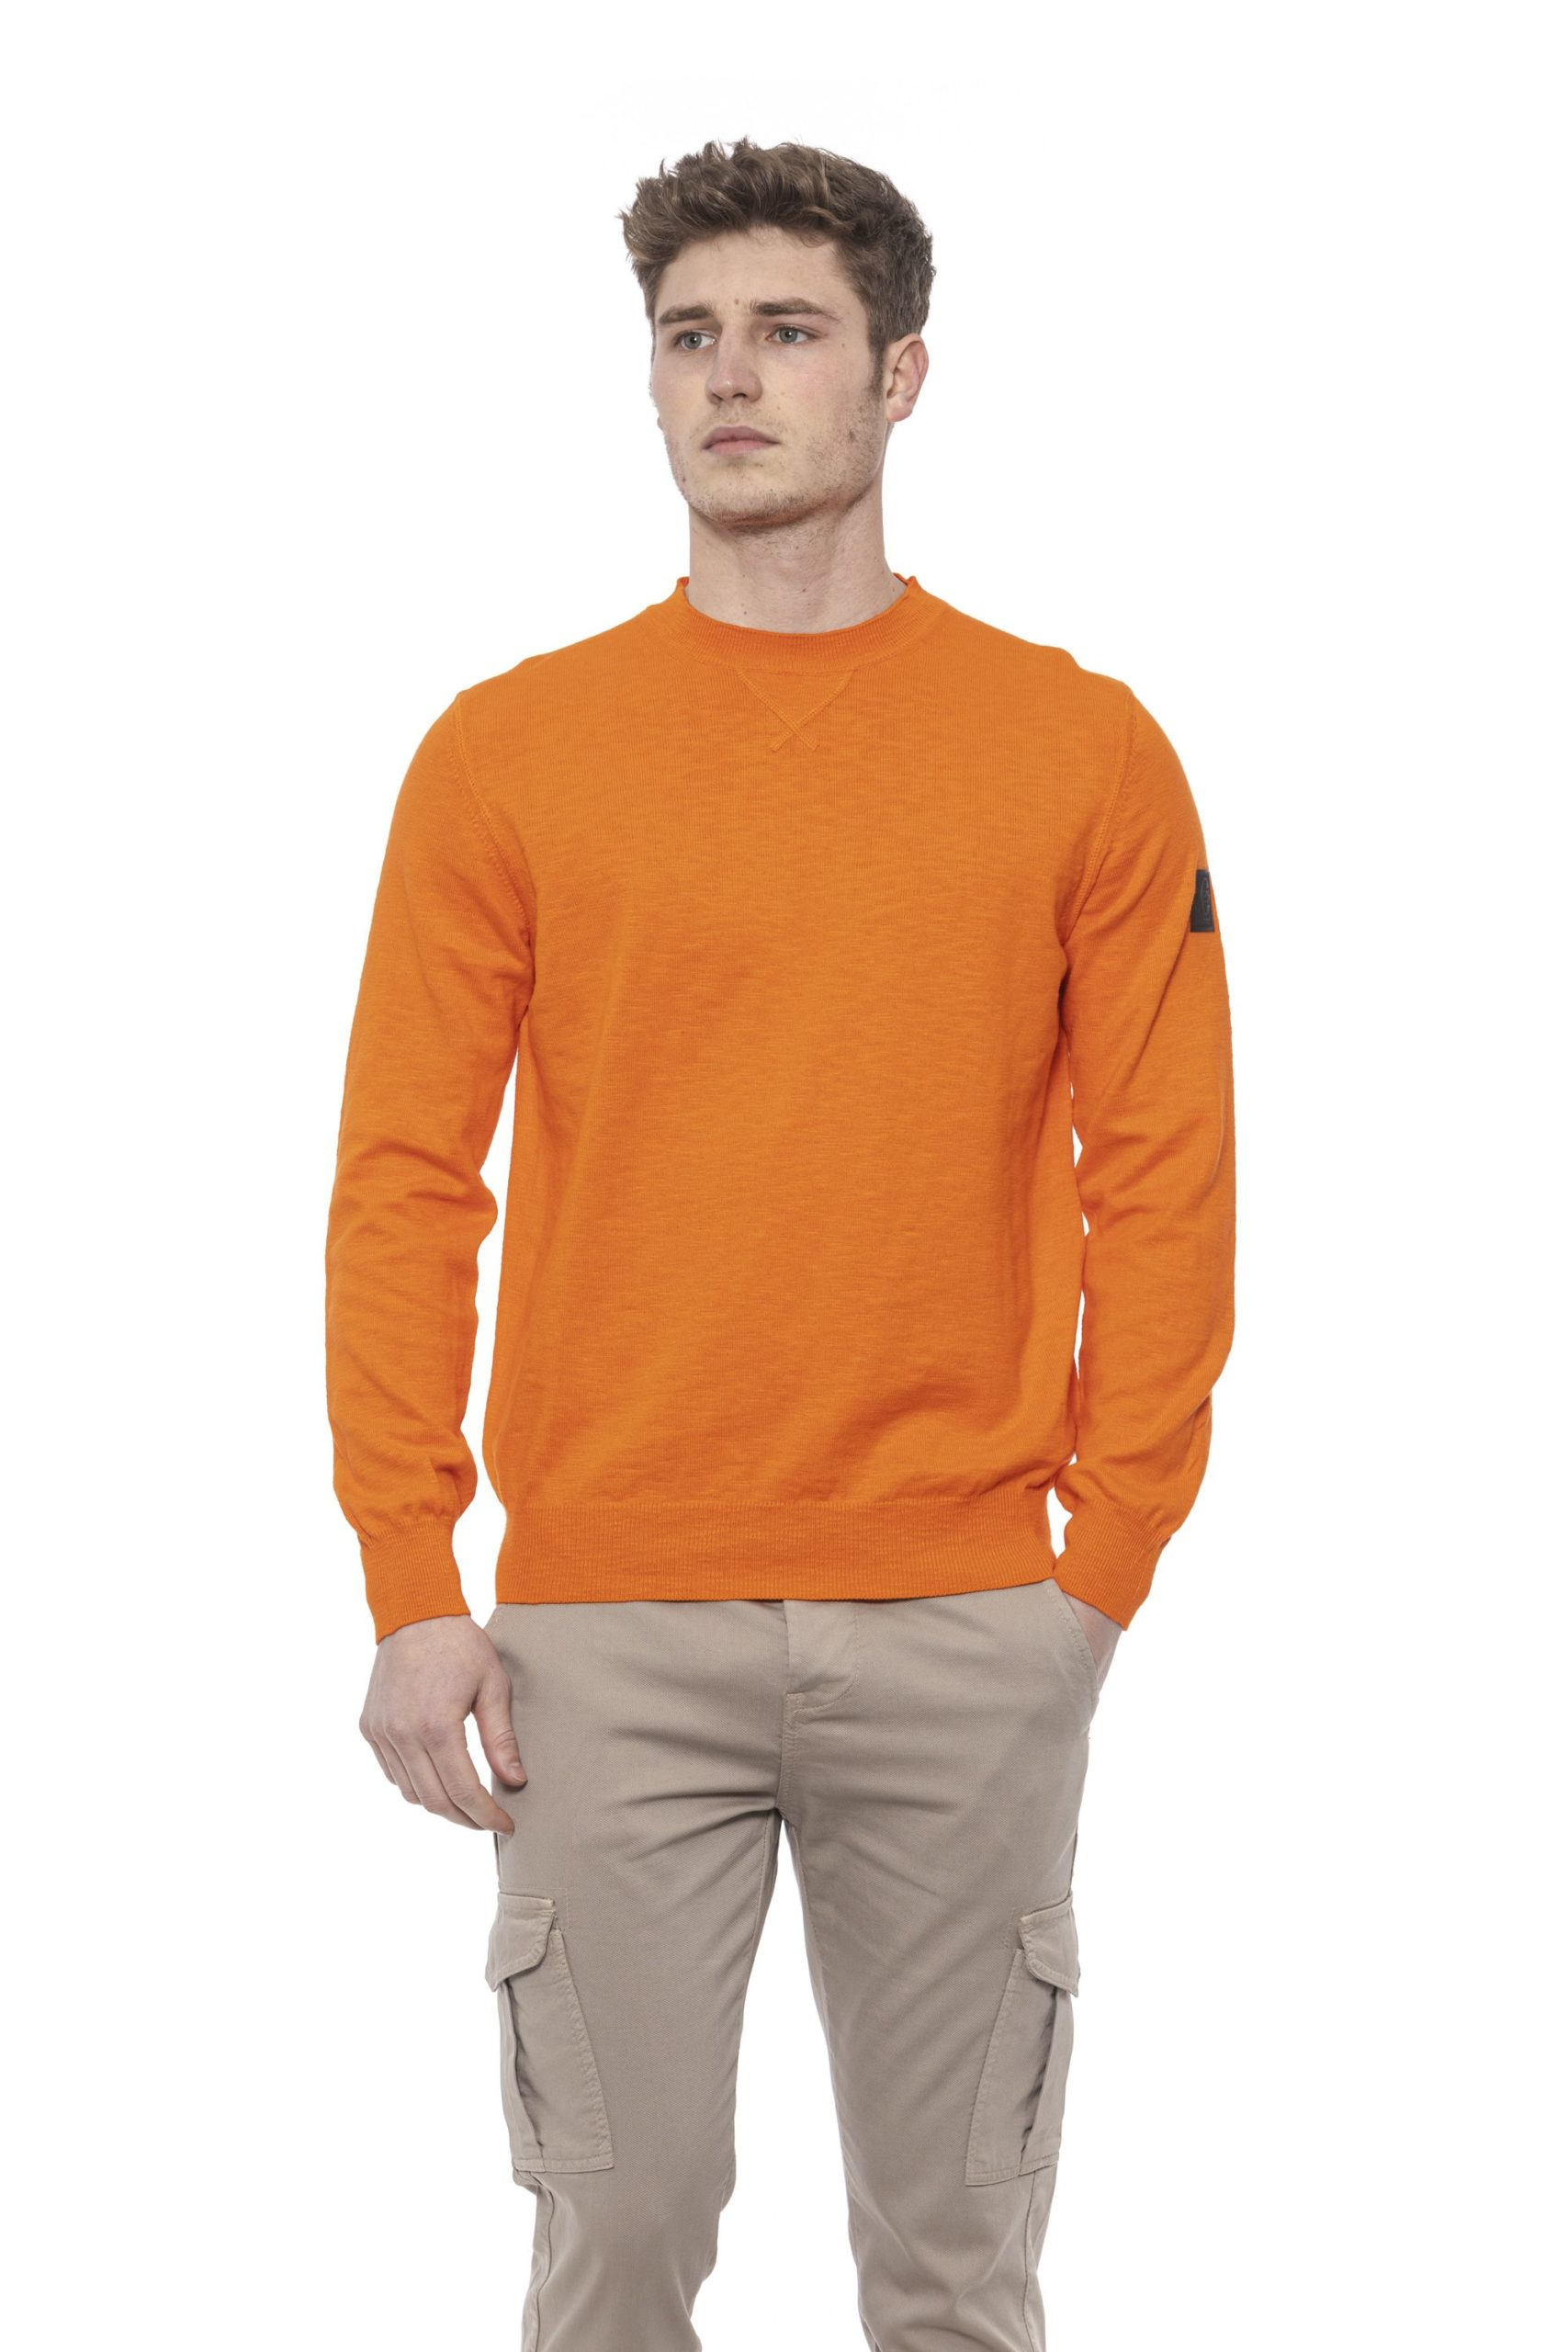 Conte of Florence Men's Sweater Orange CO1376456 - S